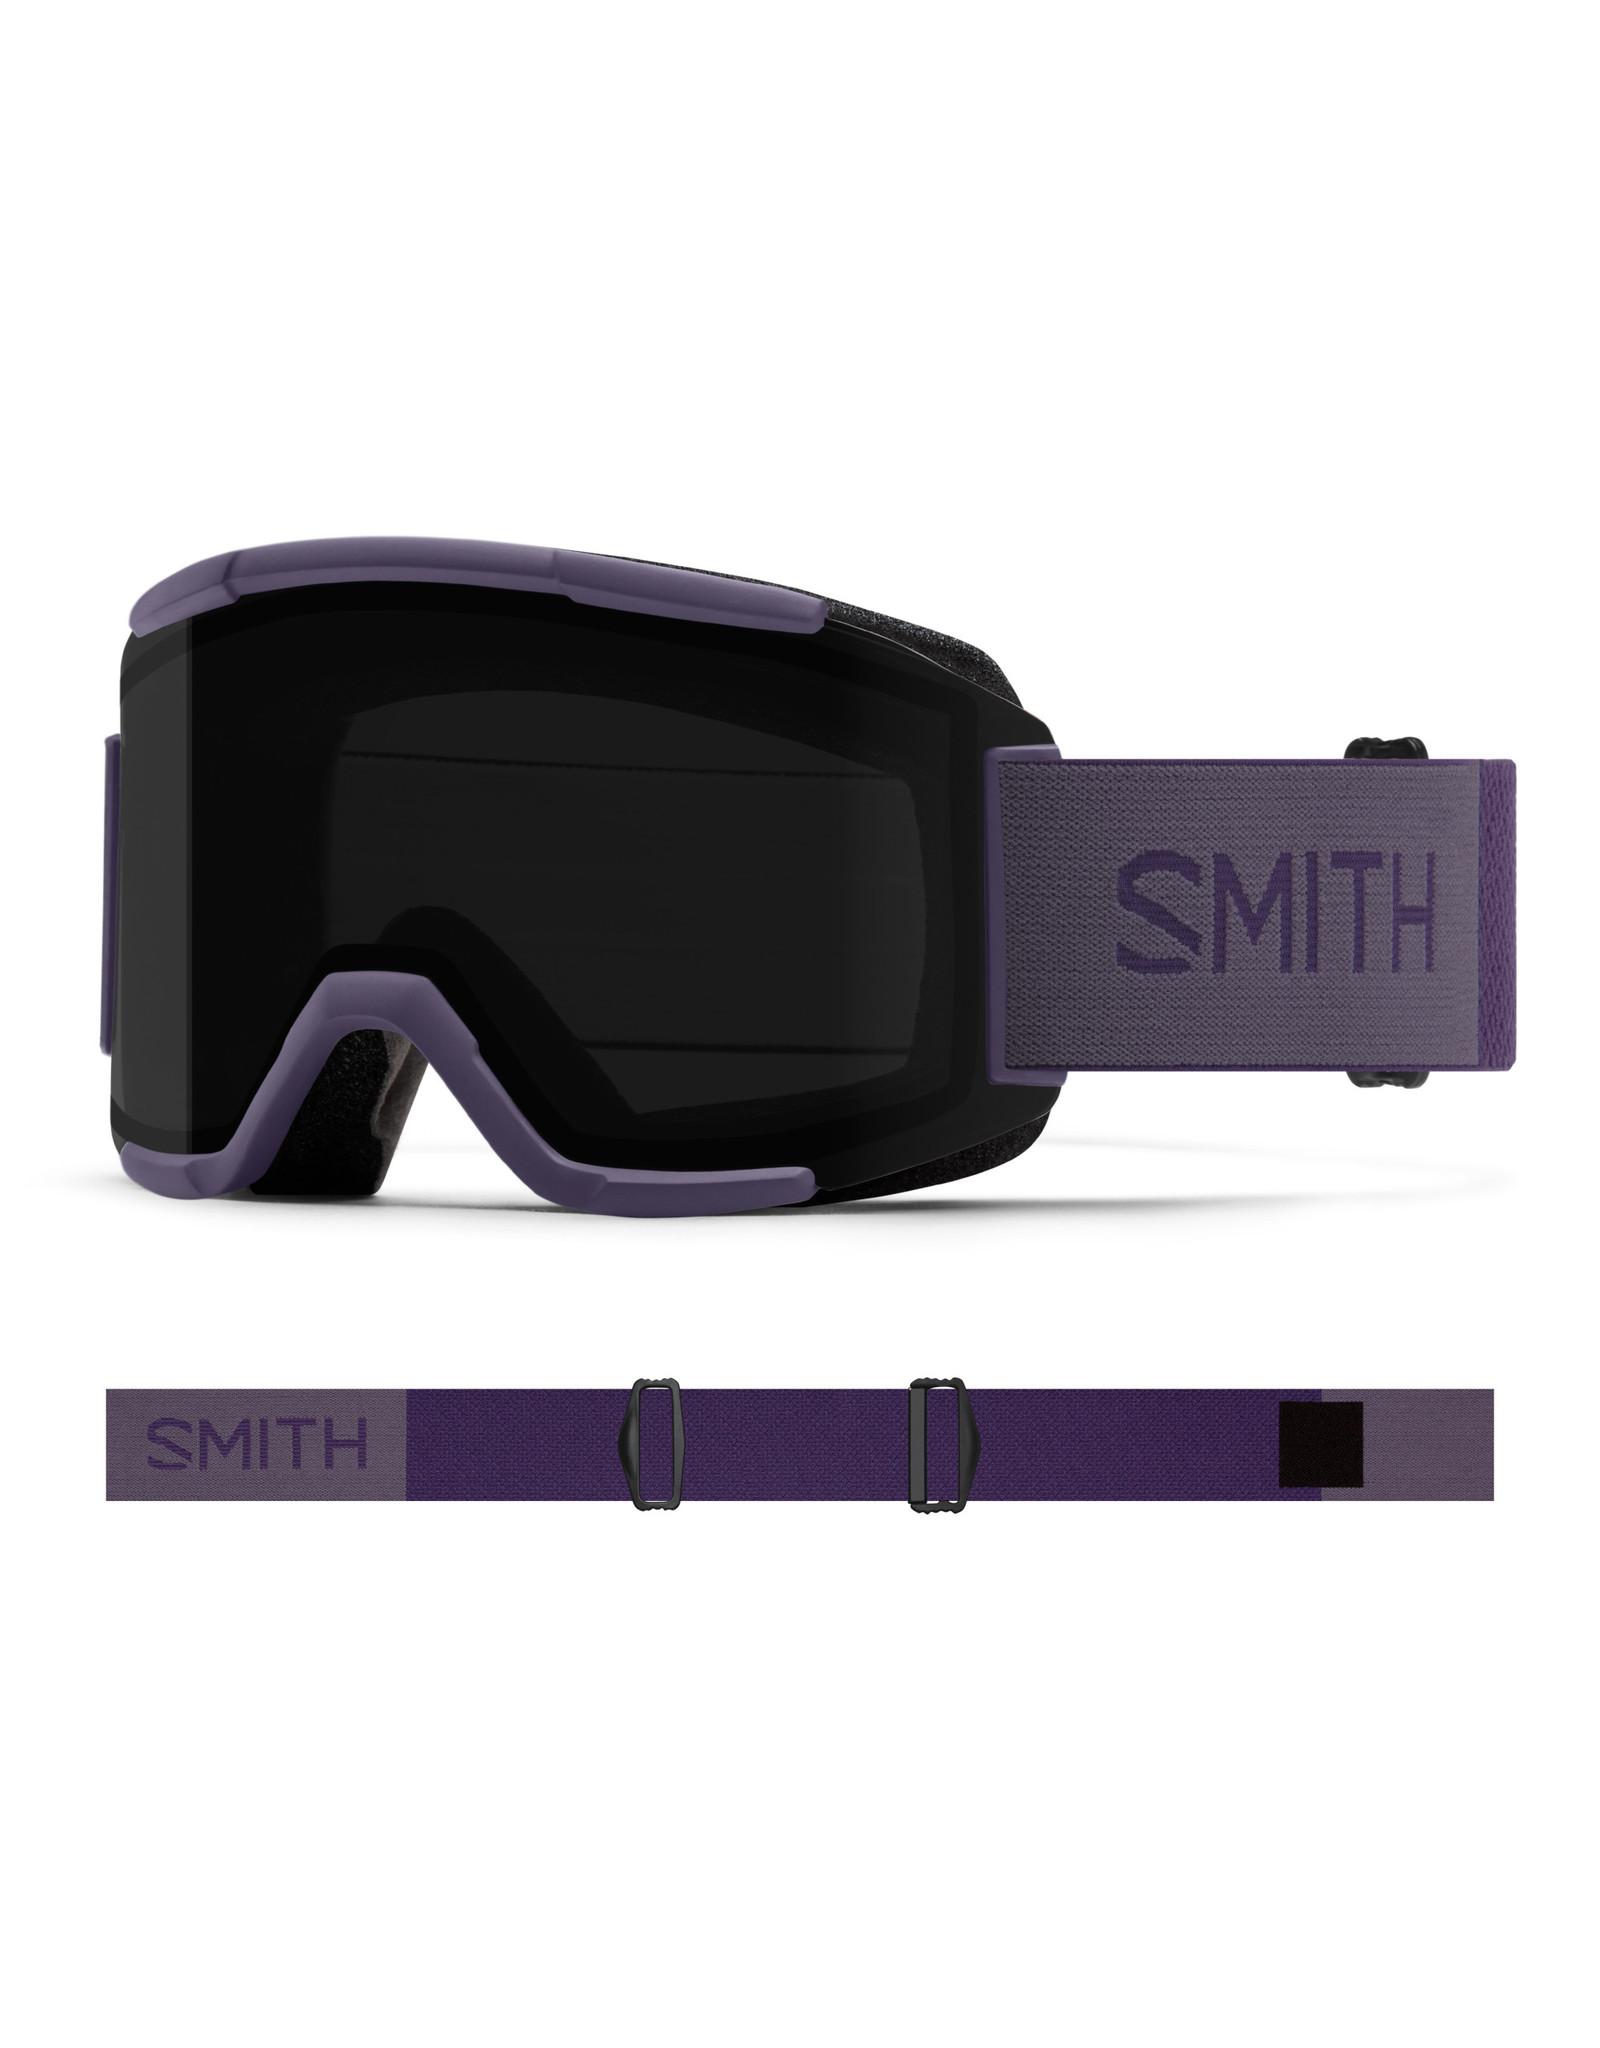 Smith SMITH SQUAD VIOLET 20 SKI GOGGLE